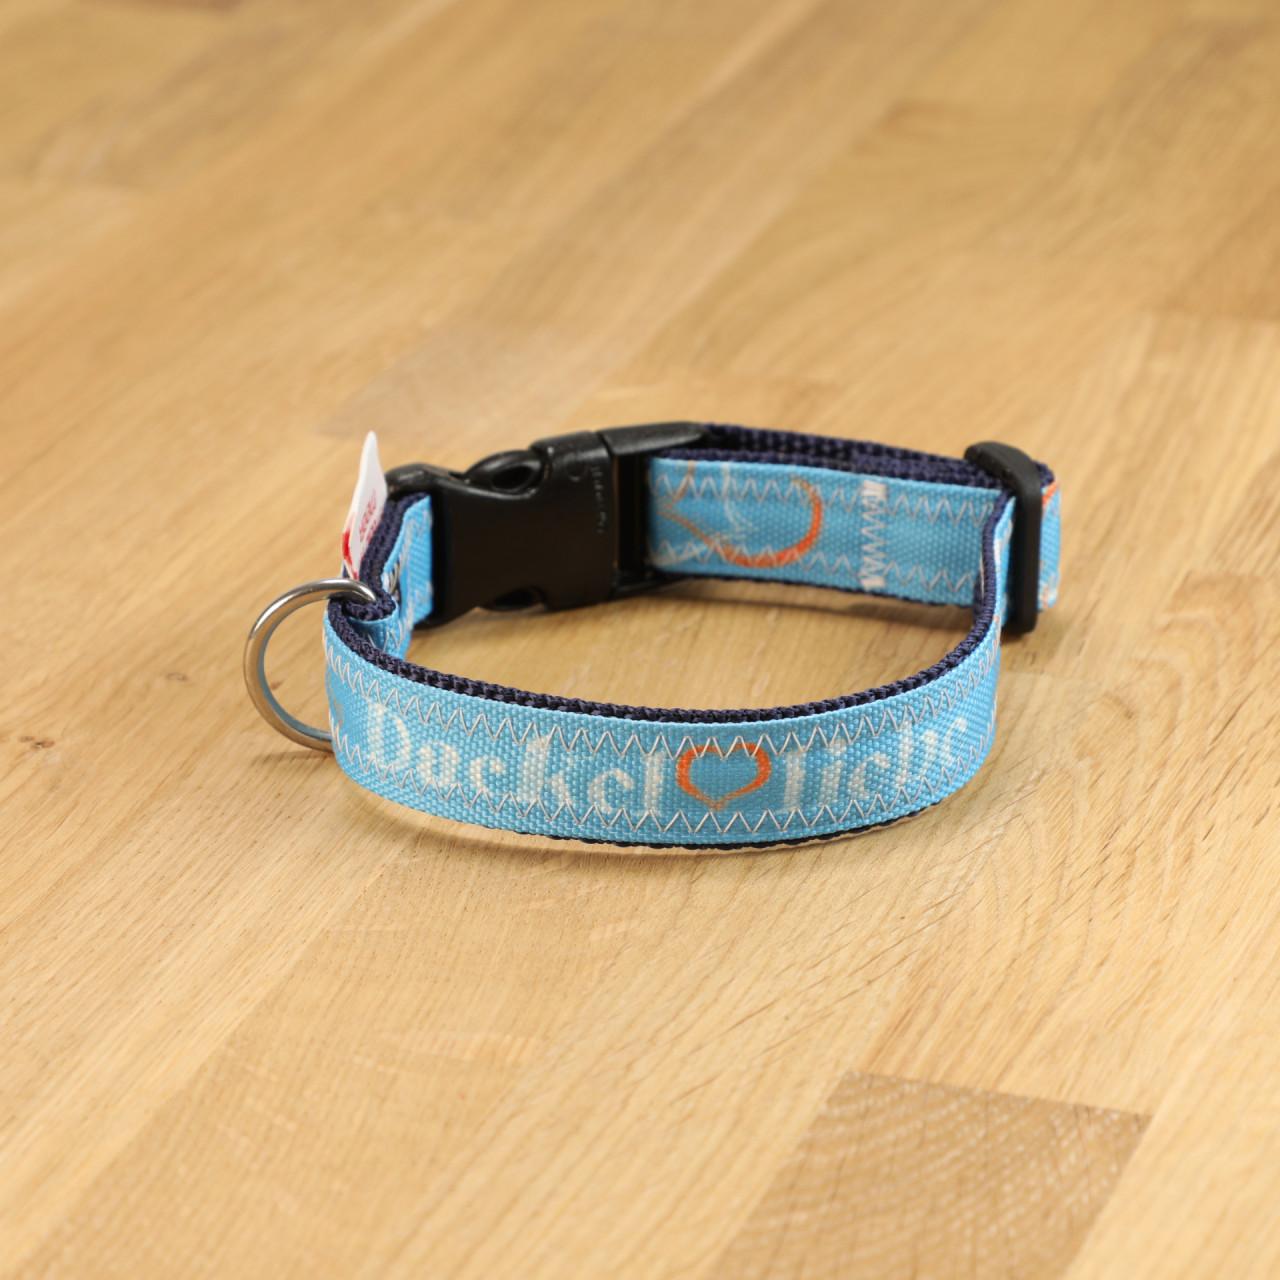 "Hundehalsband ""Dackelliebe"" Segeltuch blau & dunkelblau"